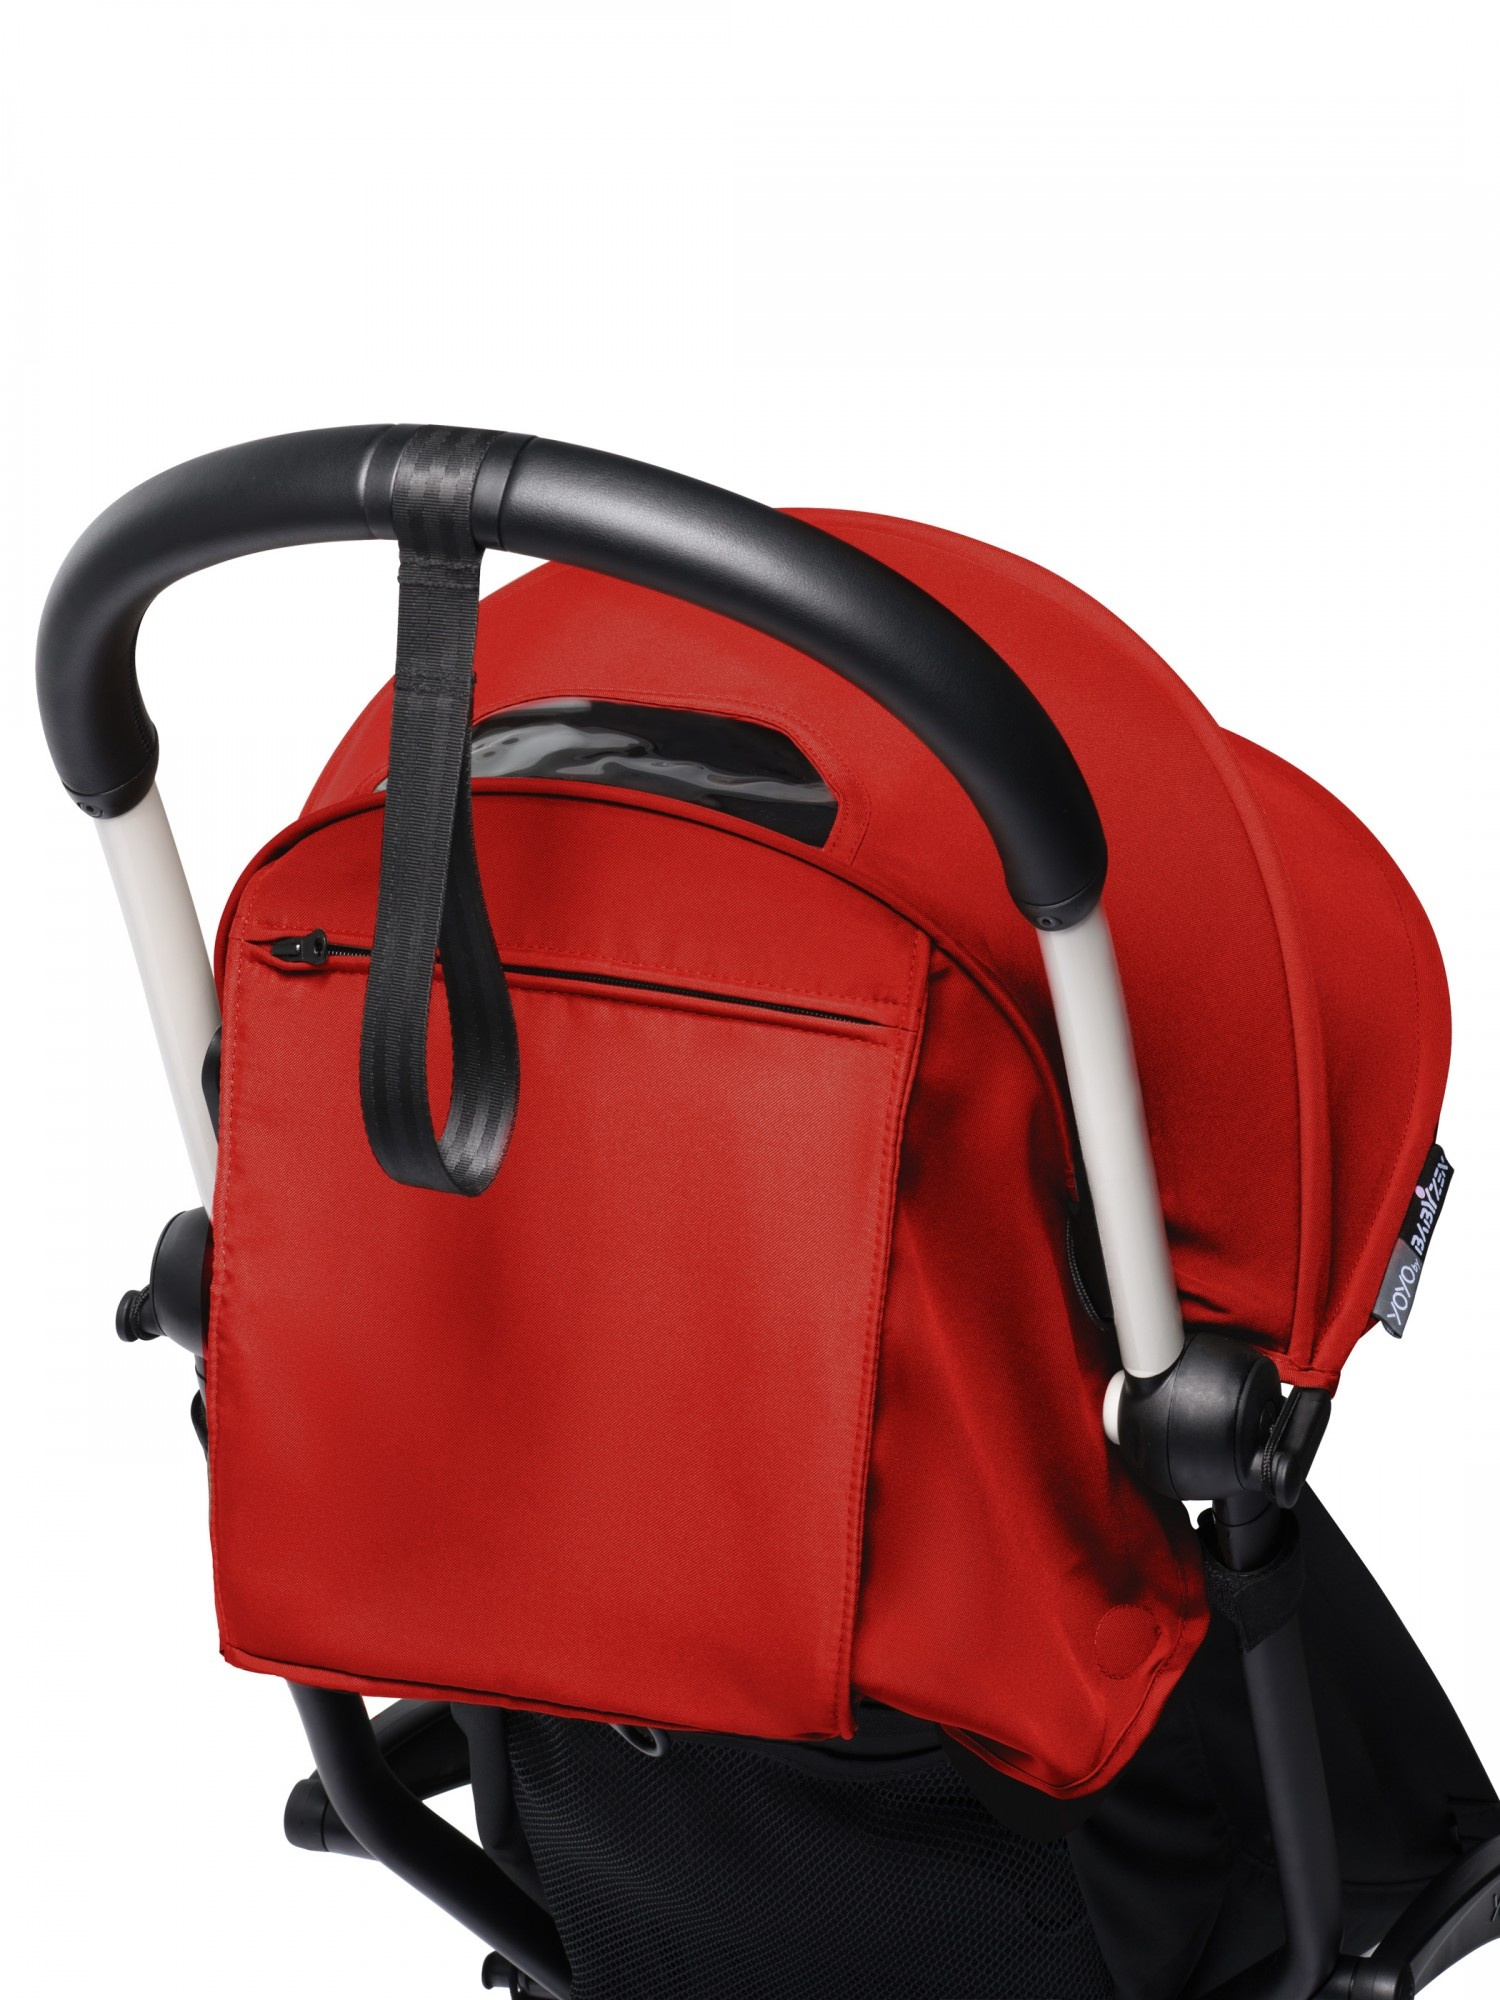 Babyzen Babyzen YOYO² buggy 6+ rood frame wit